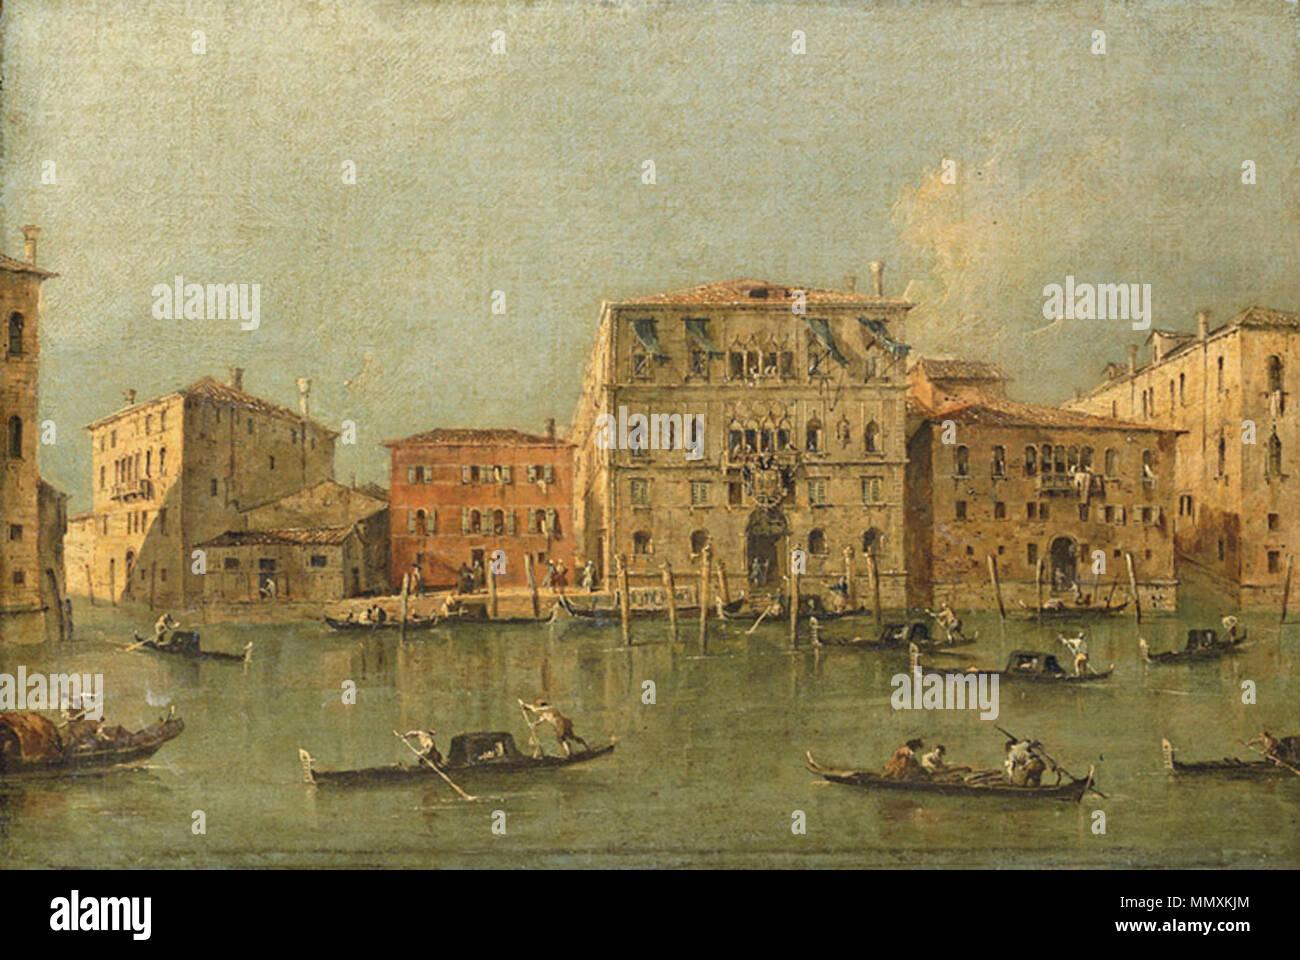 . View of the Palazzo Loredan dell'Ambasciatore on the Grand Canal, Venice  . Unknown date. Francesco Guardi. View of the Palazzo Loredan dell'Ambasciatore on the Grand Canal, Venice Stock Photo